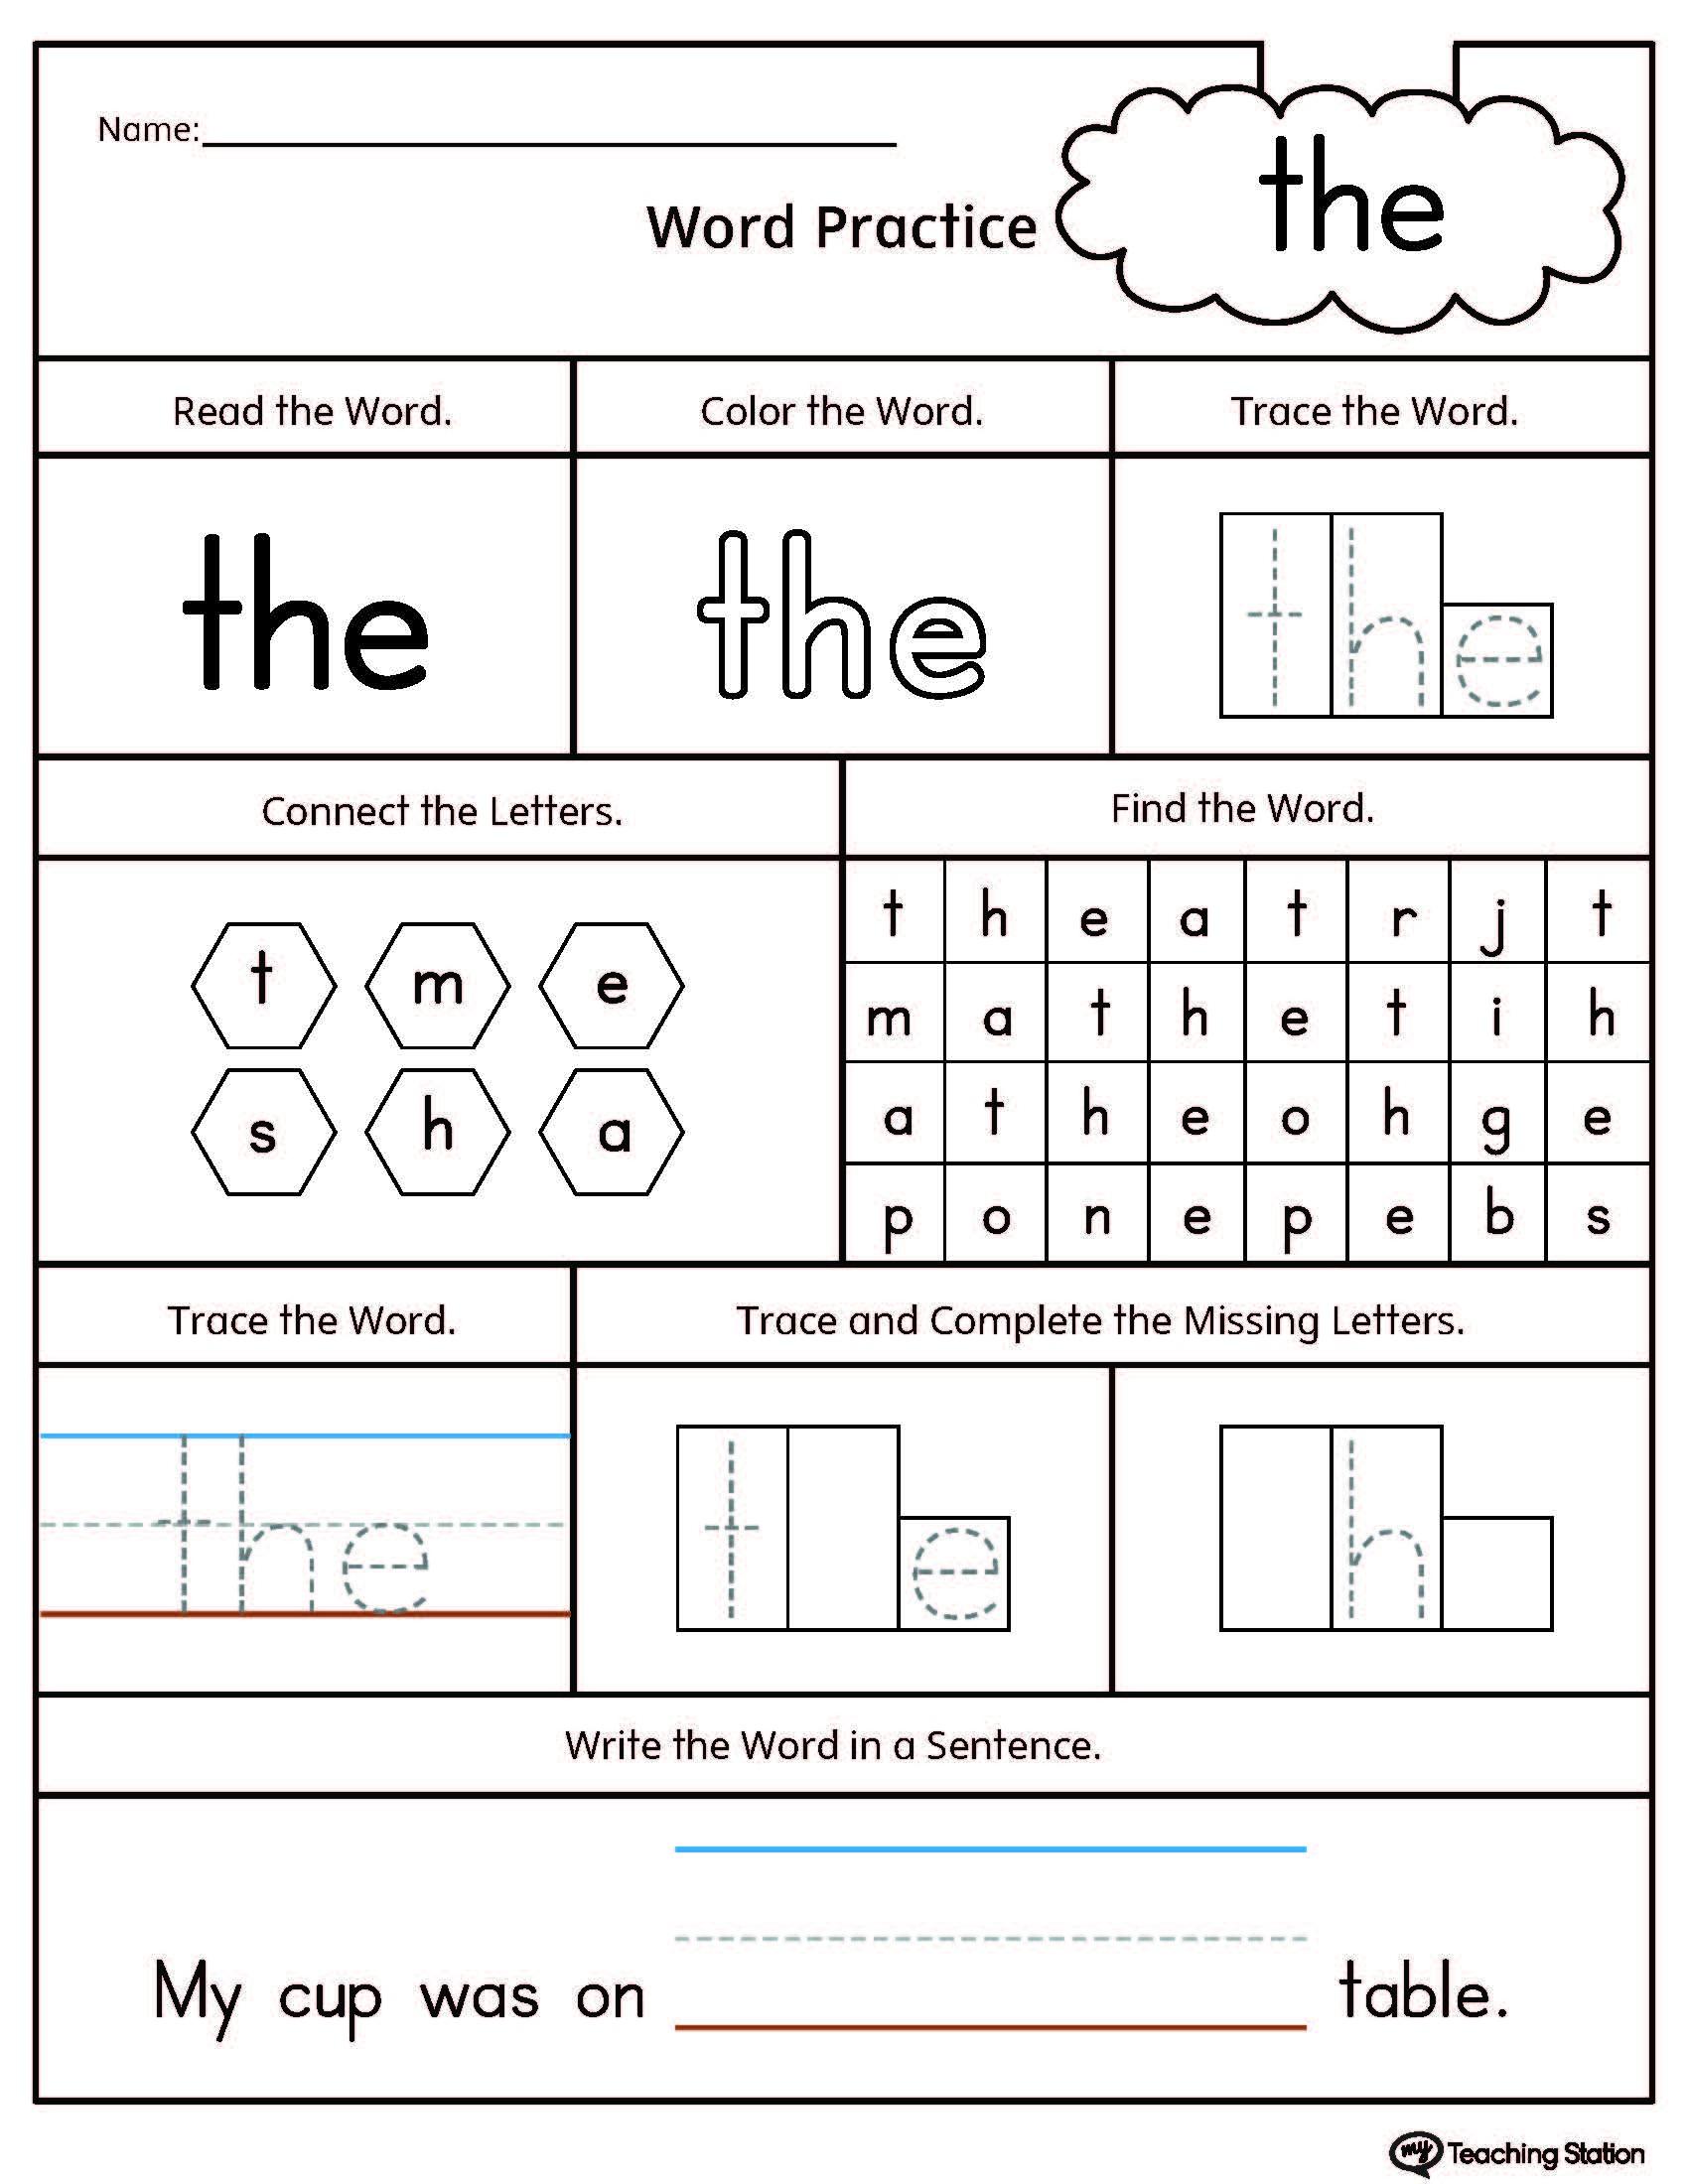 Sight Word The Printable Worksheet   Myteachingstation - Free Printable Sight Word Worksheets